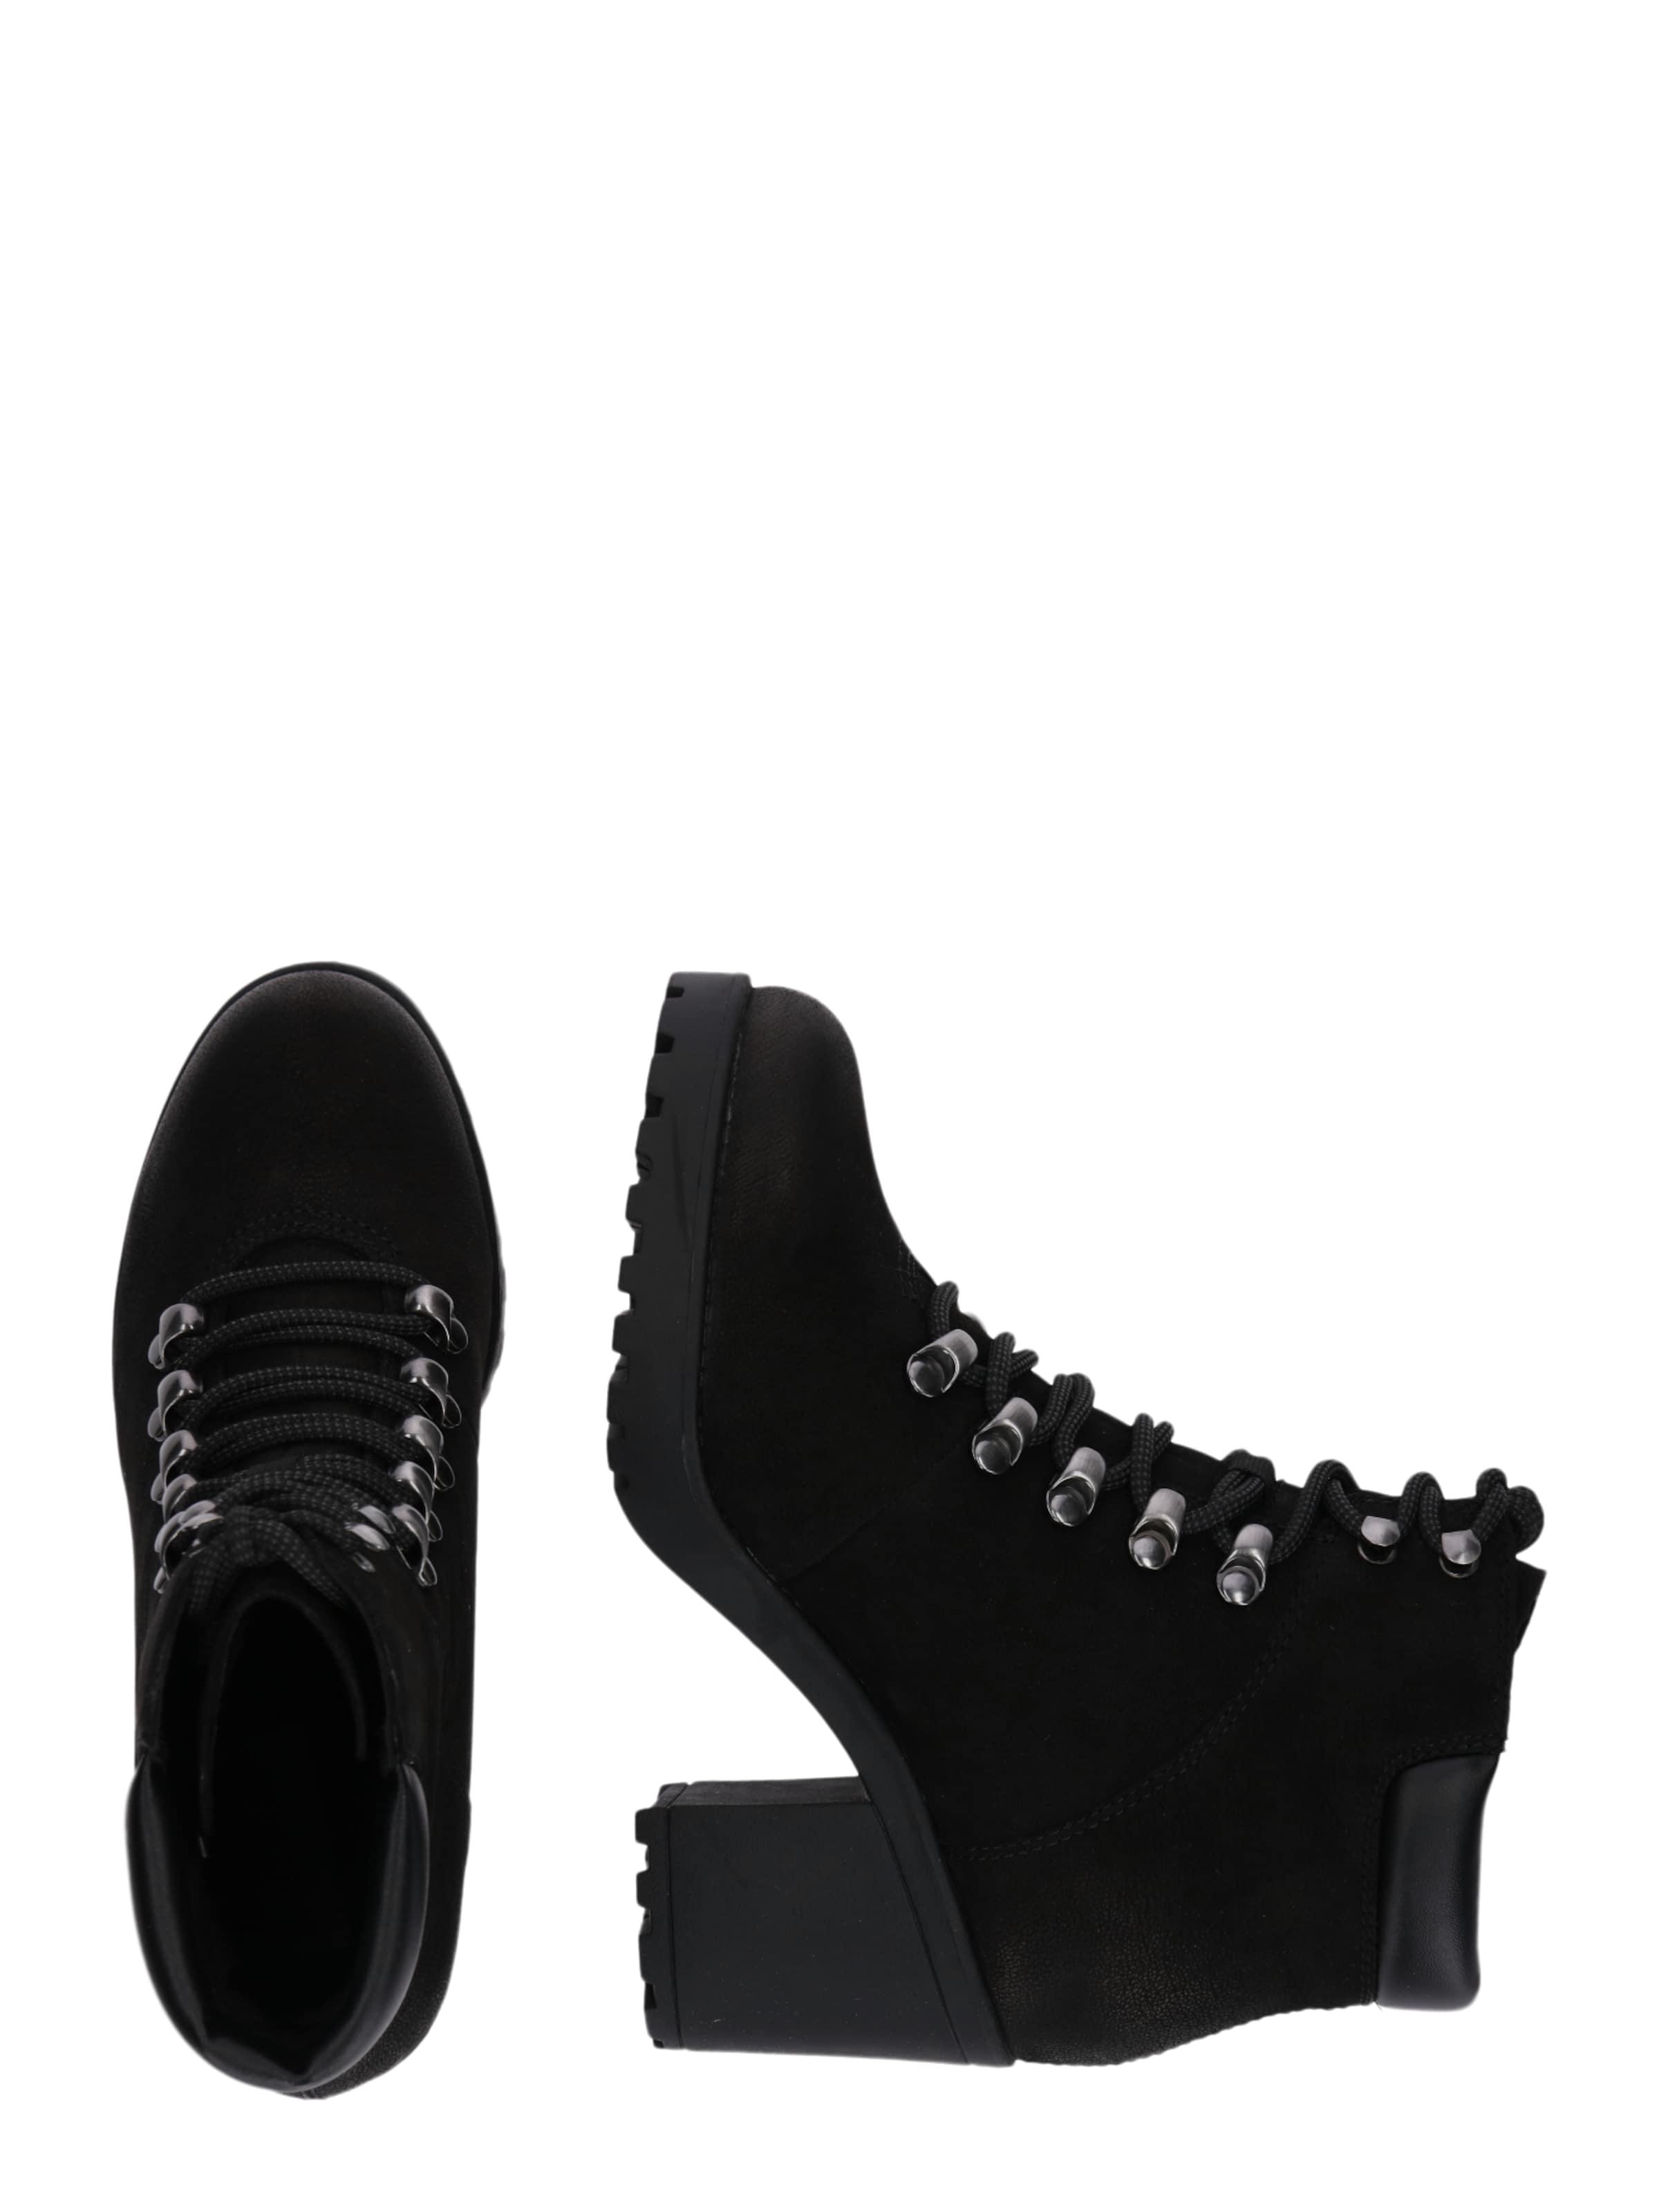 'grace' Vagabond En Shoemakers Bottines Noir lJK1cF